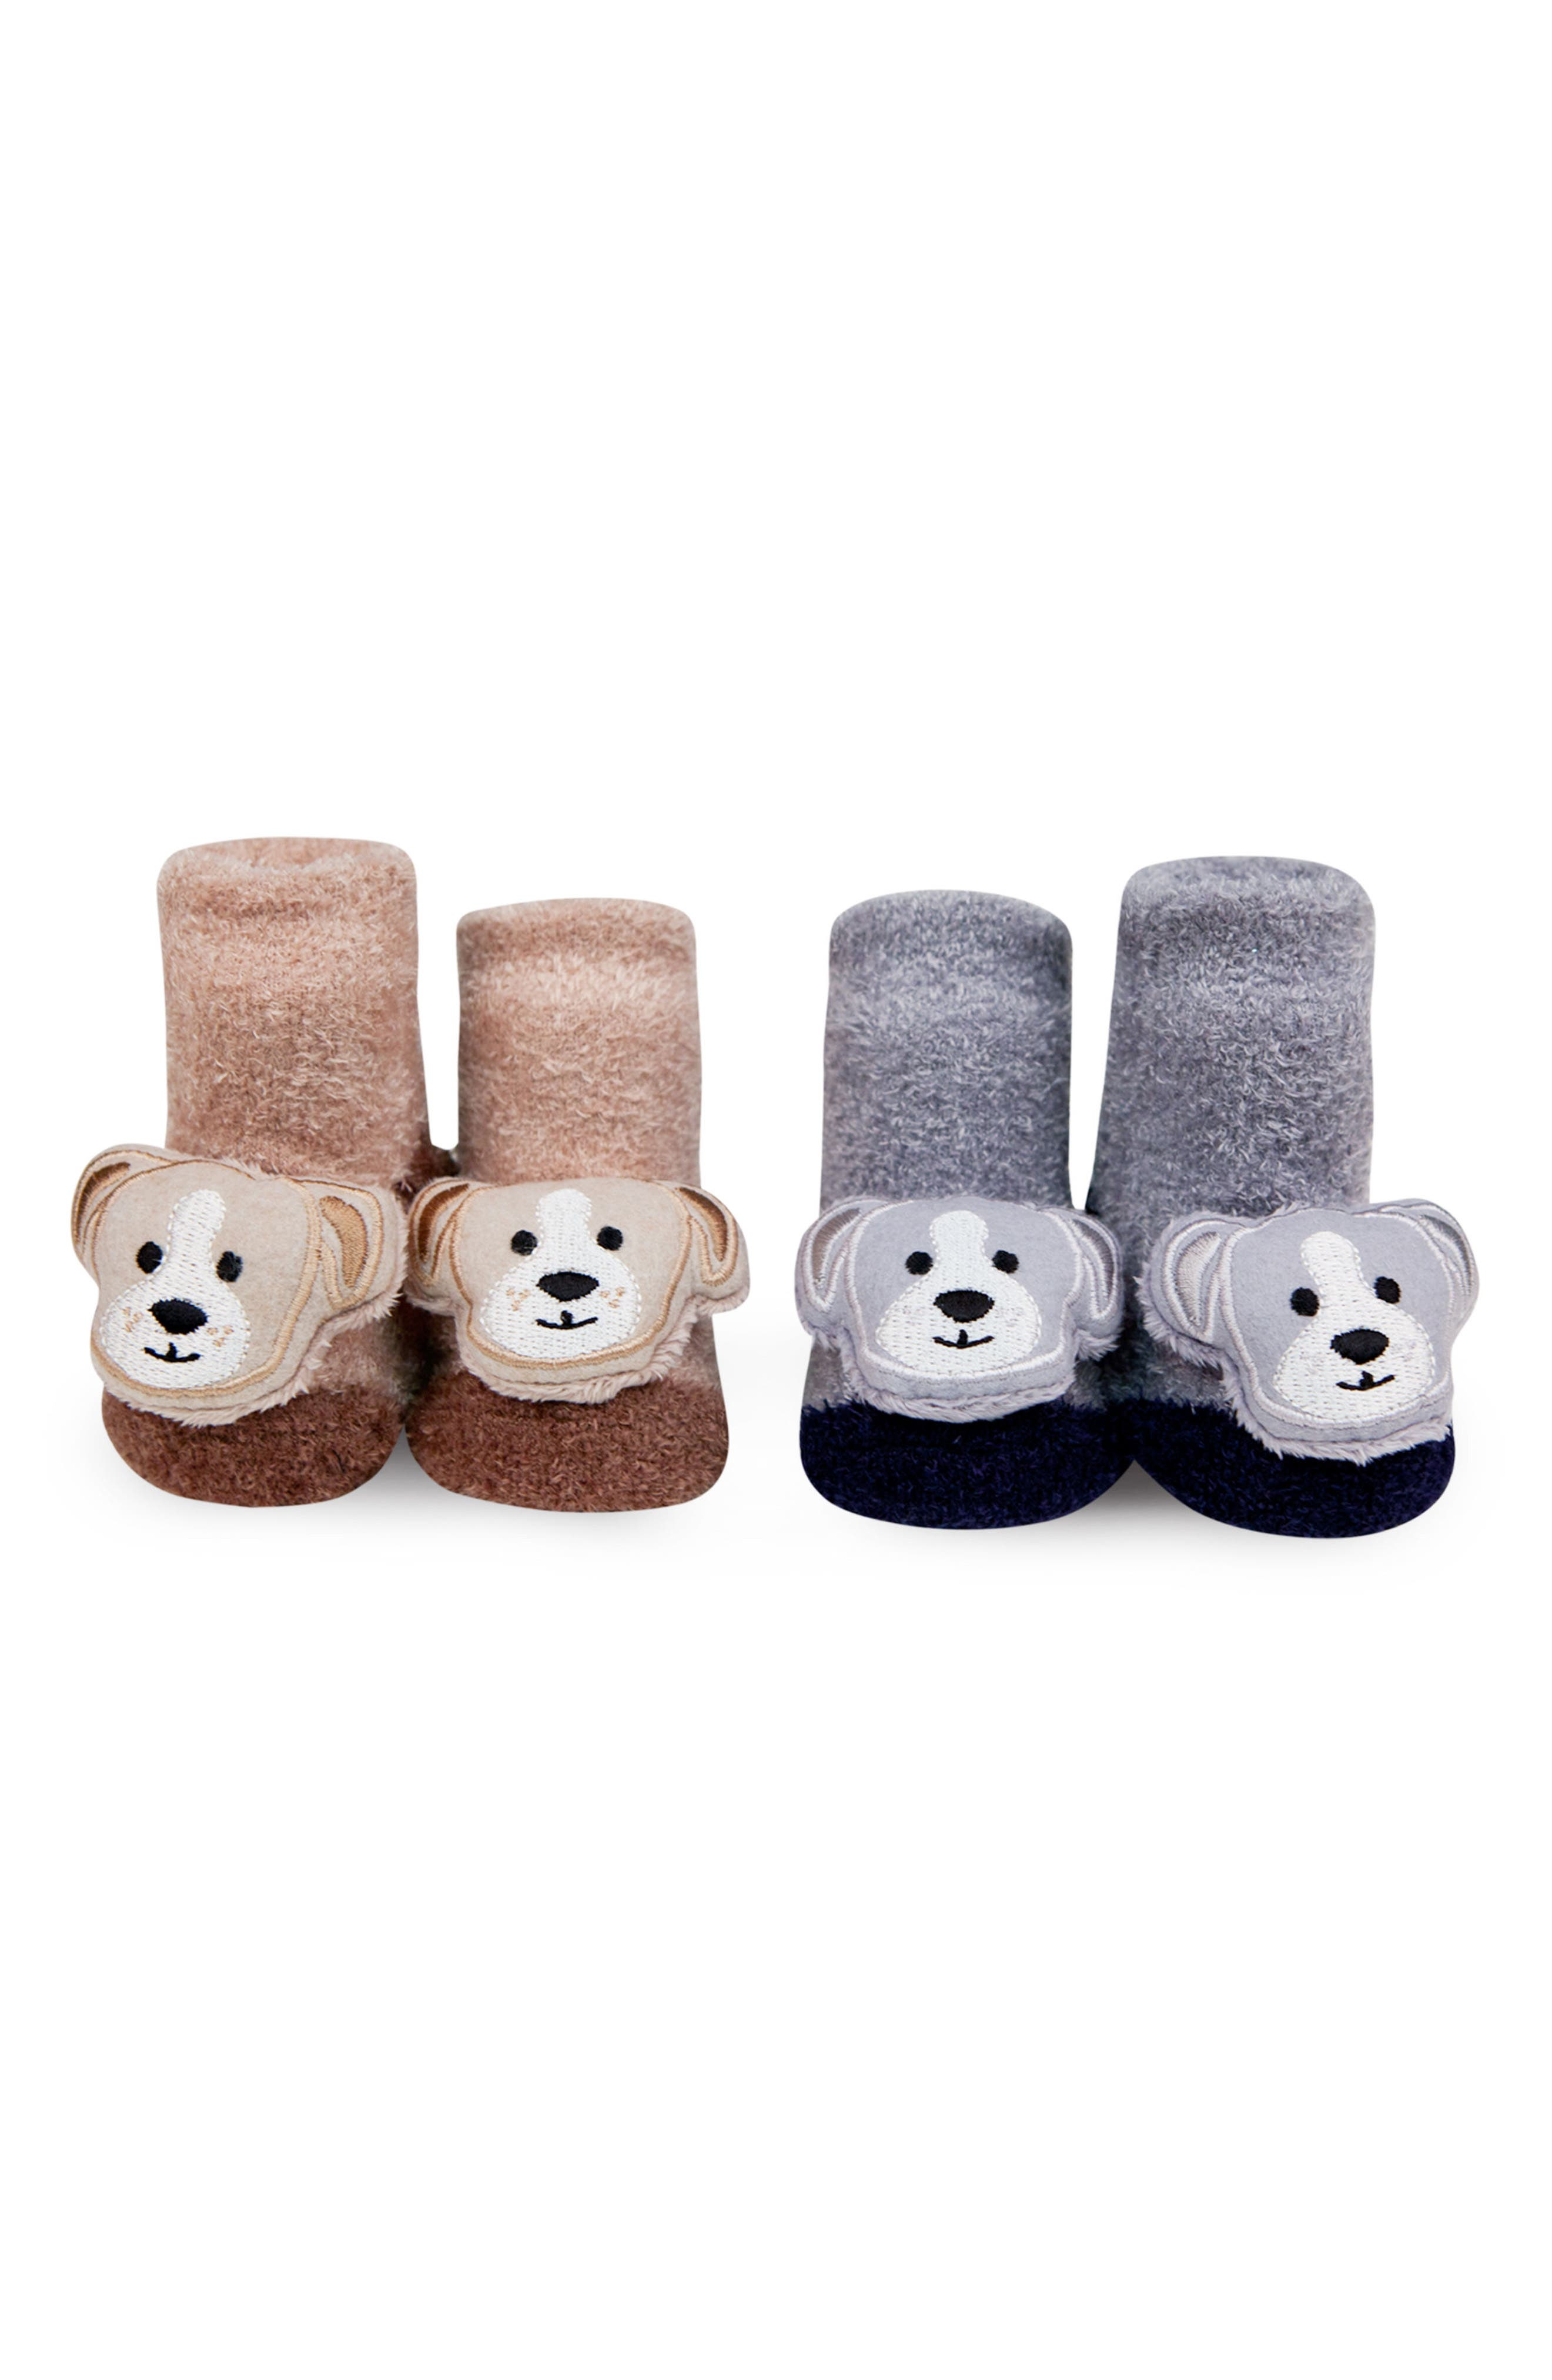 2-Pack Animal Rattle Socks,                         Main,                         color, Brown/ Grey